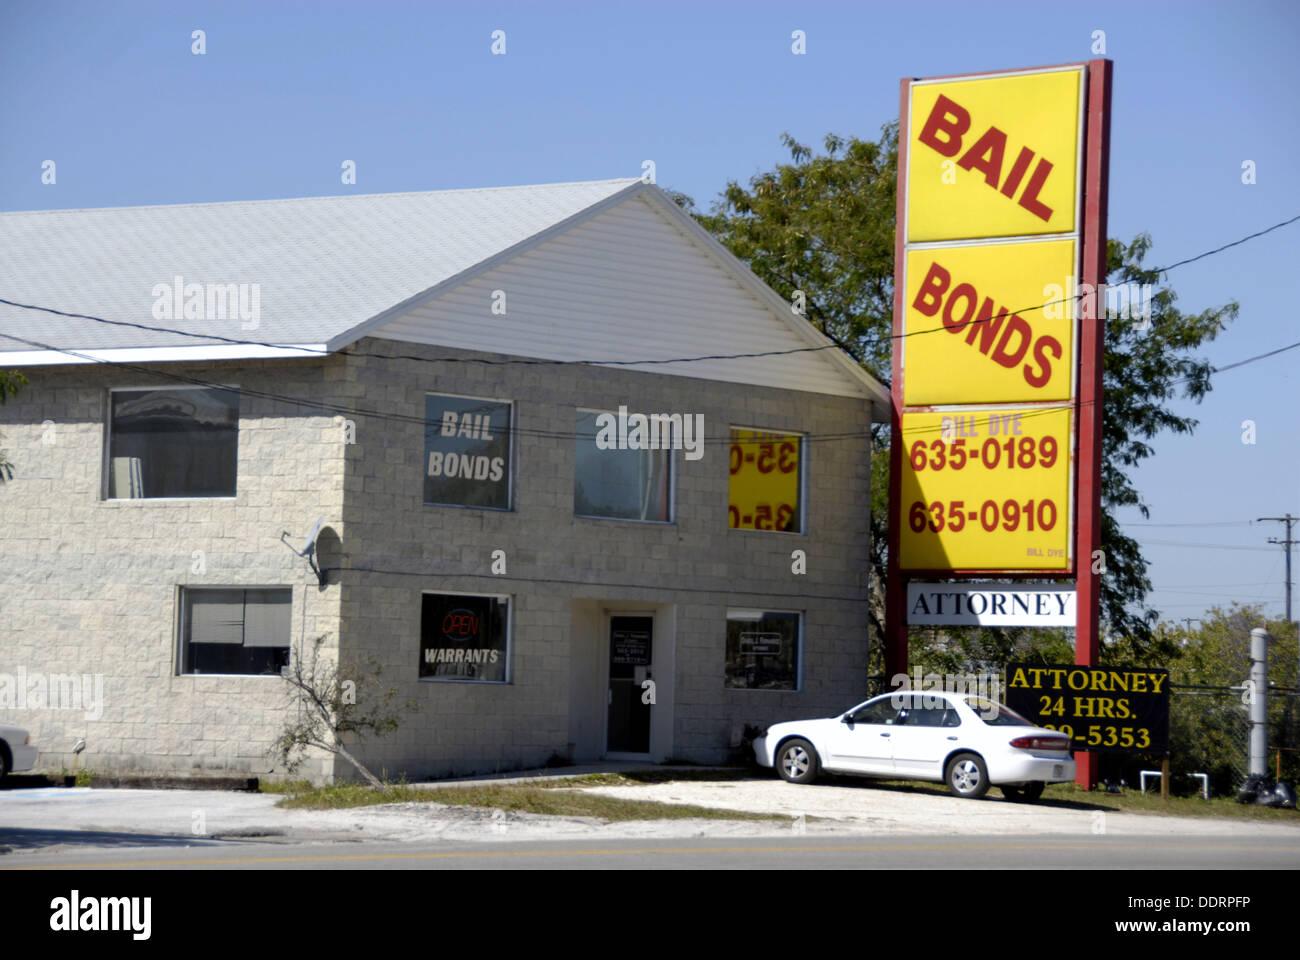 Bail Bonds establishments - Stock Image